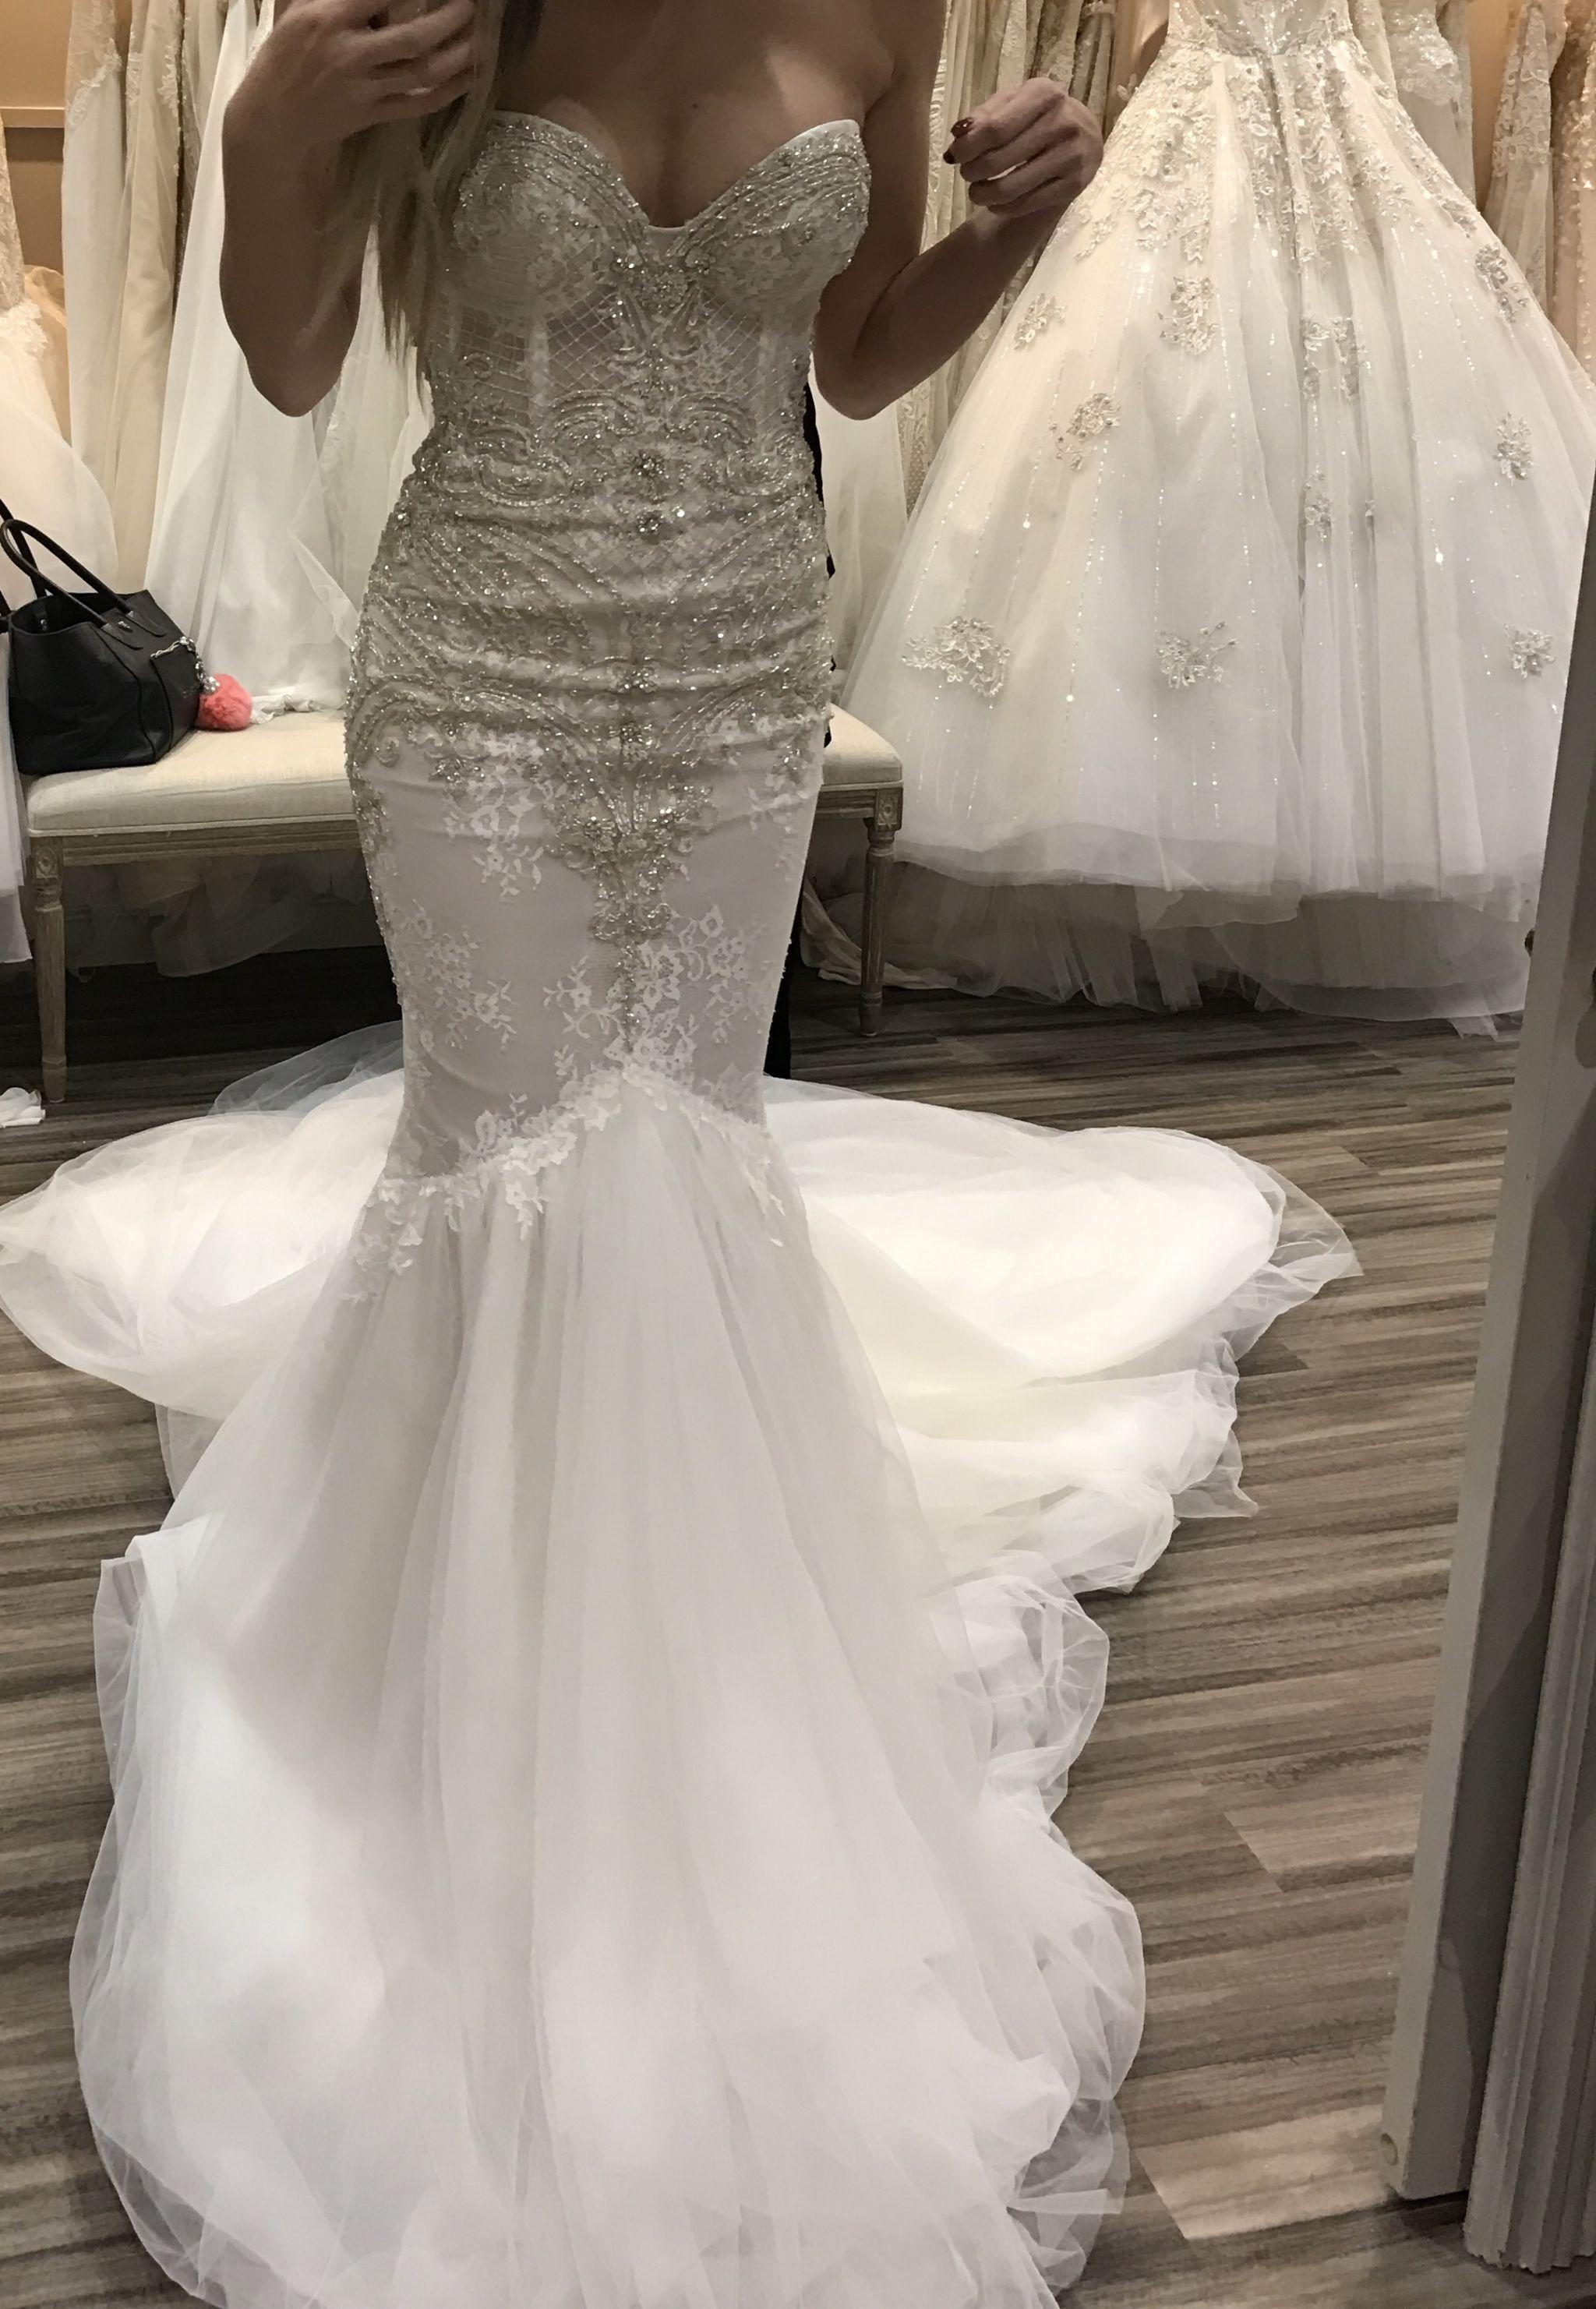 Berta 220 220 Wedding Dress   Used, Size 20, $20,22020   Dresses ...